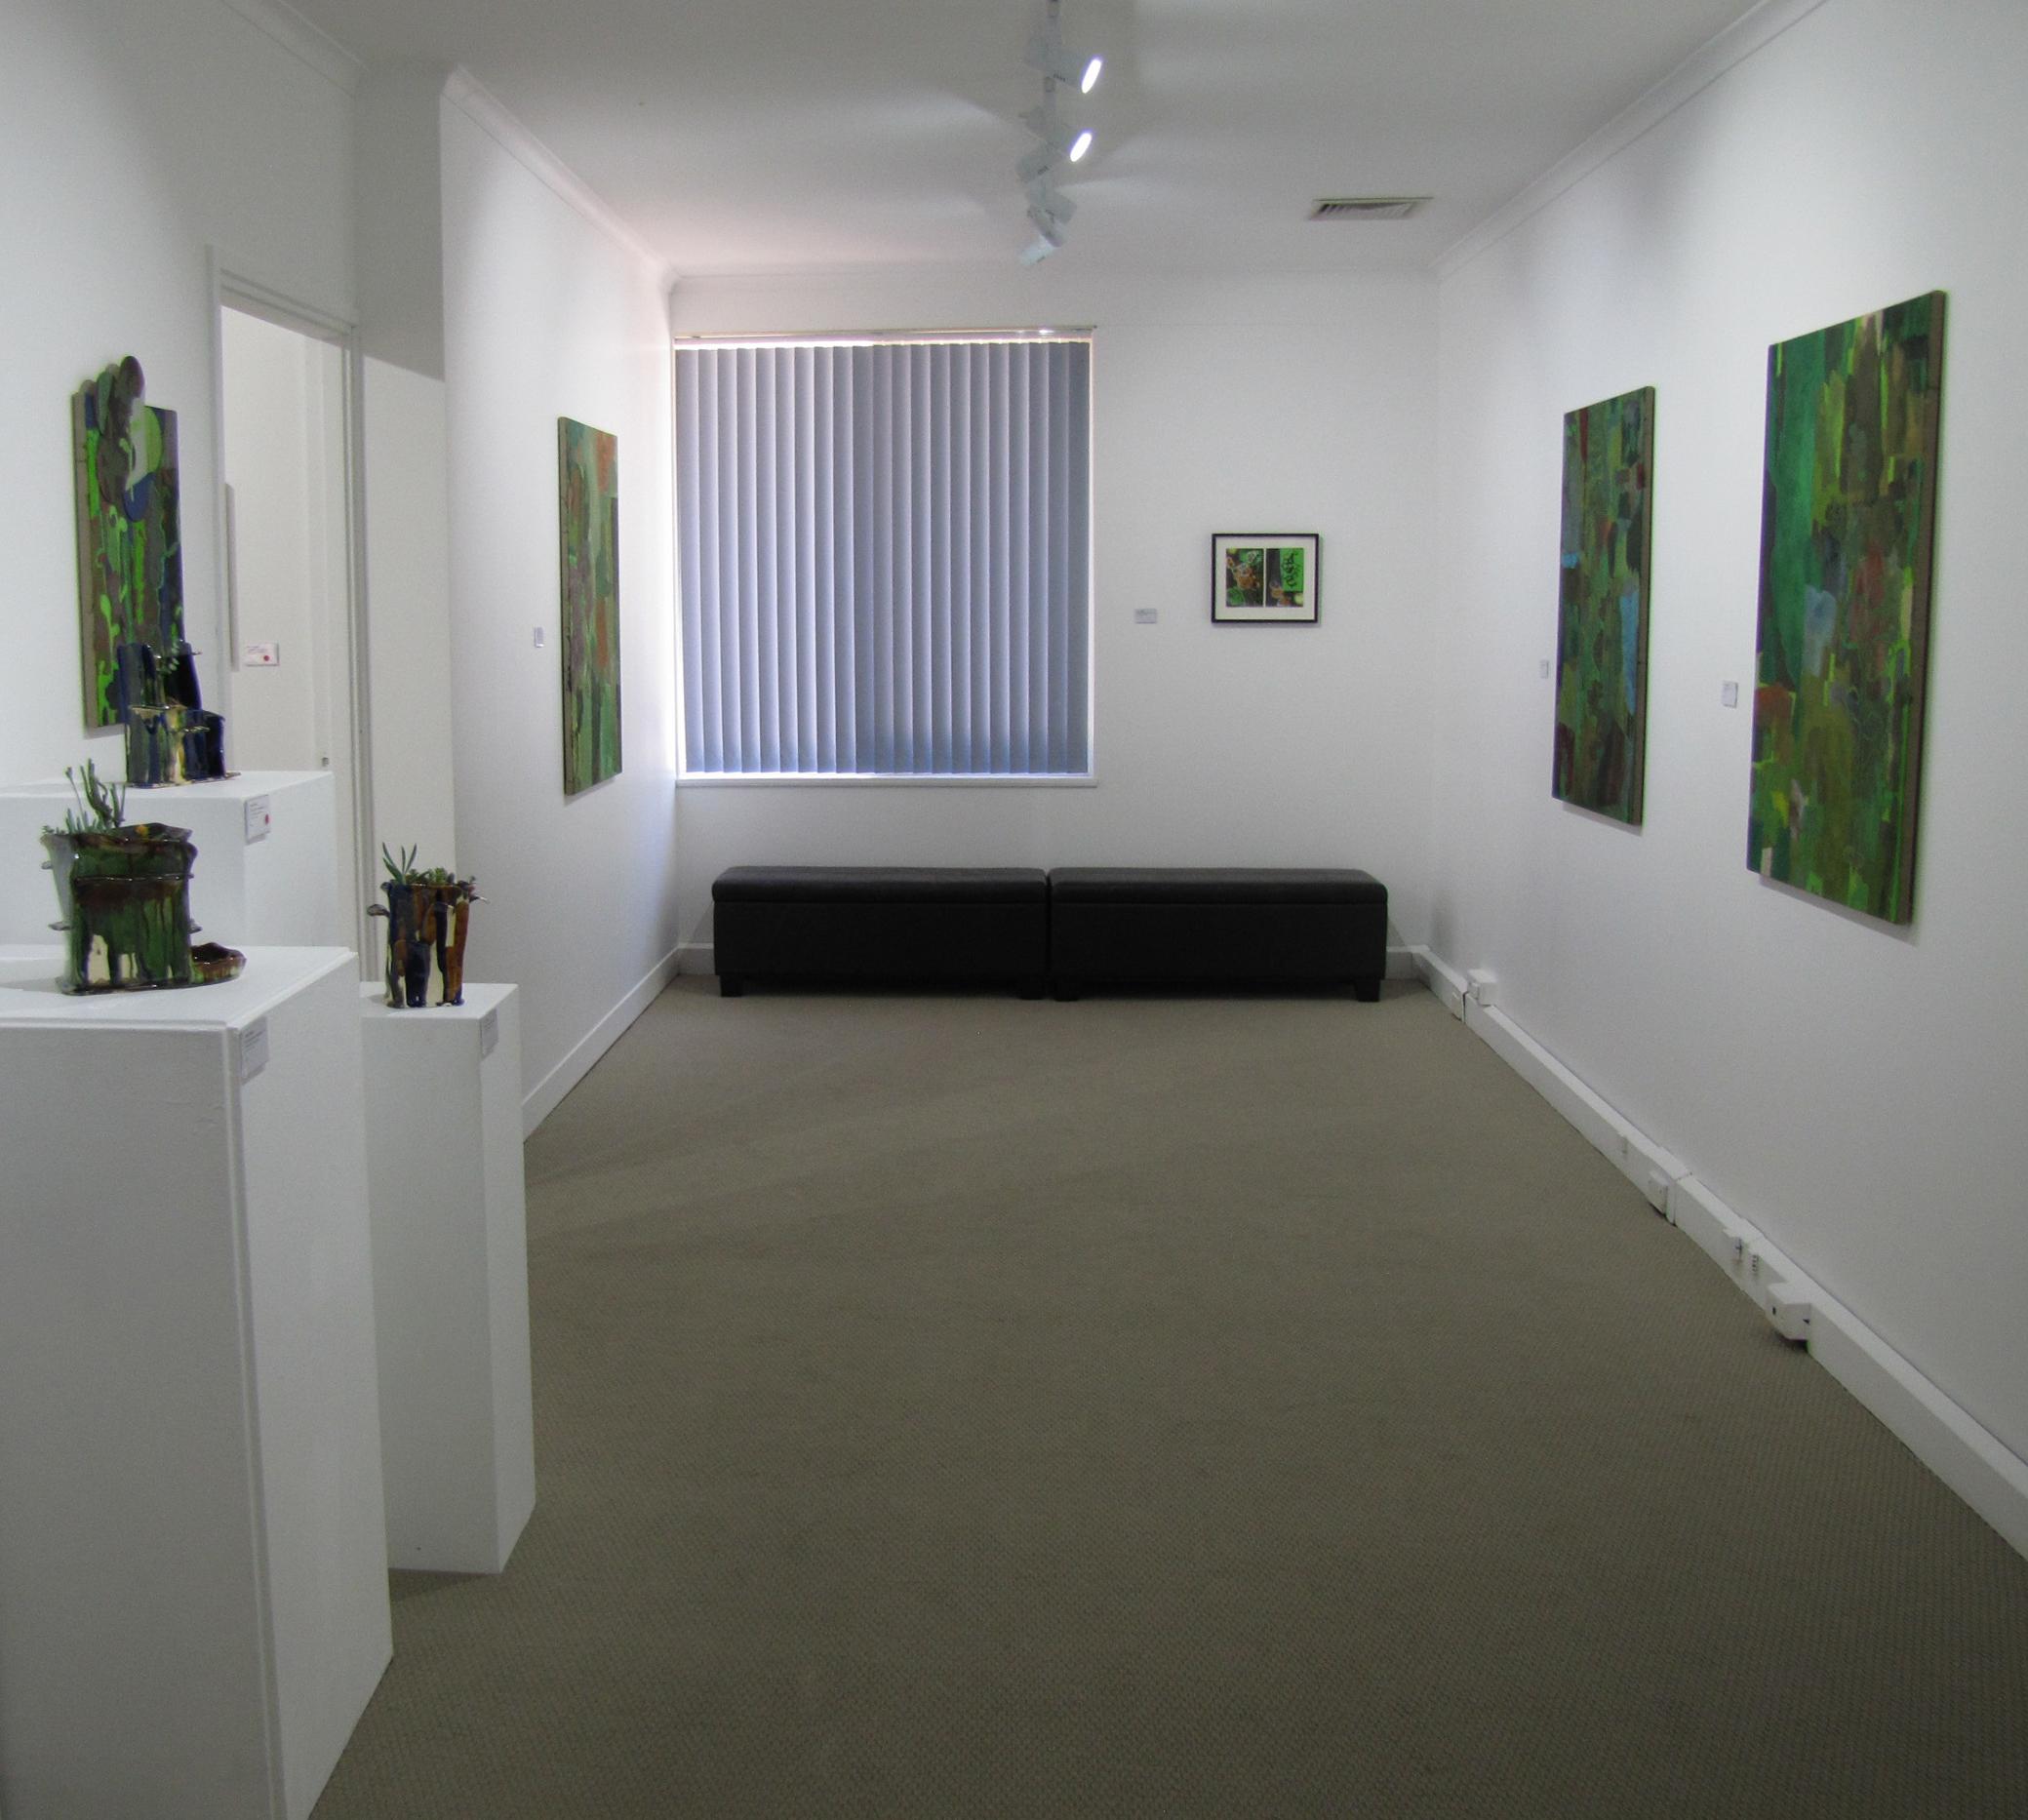 NSG. Waller 2 exhibition. Exhibition views 1.jpg